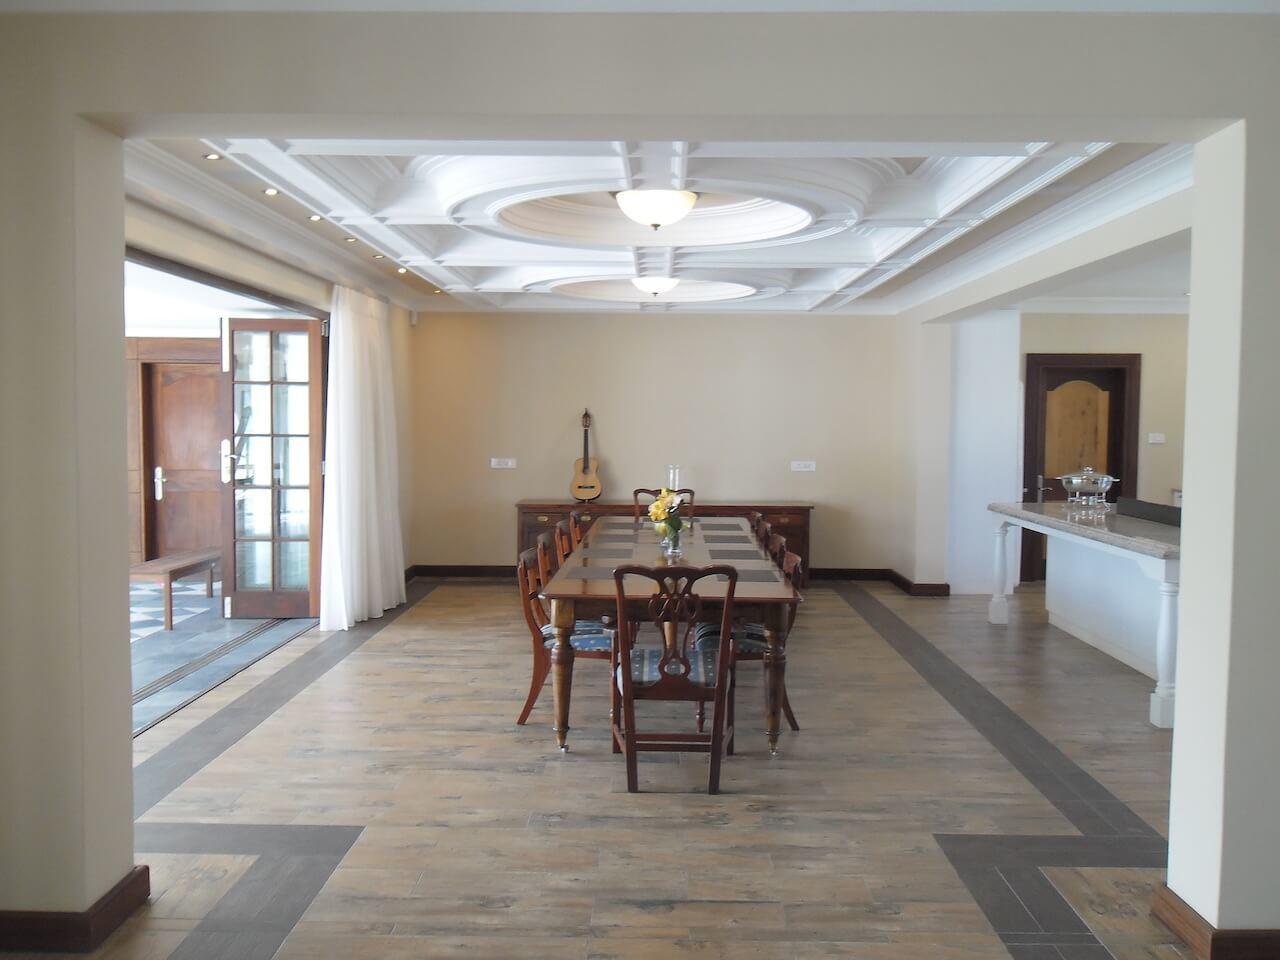 Main Communal Dining Room